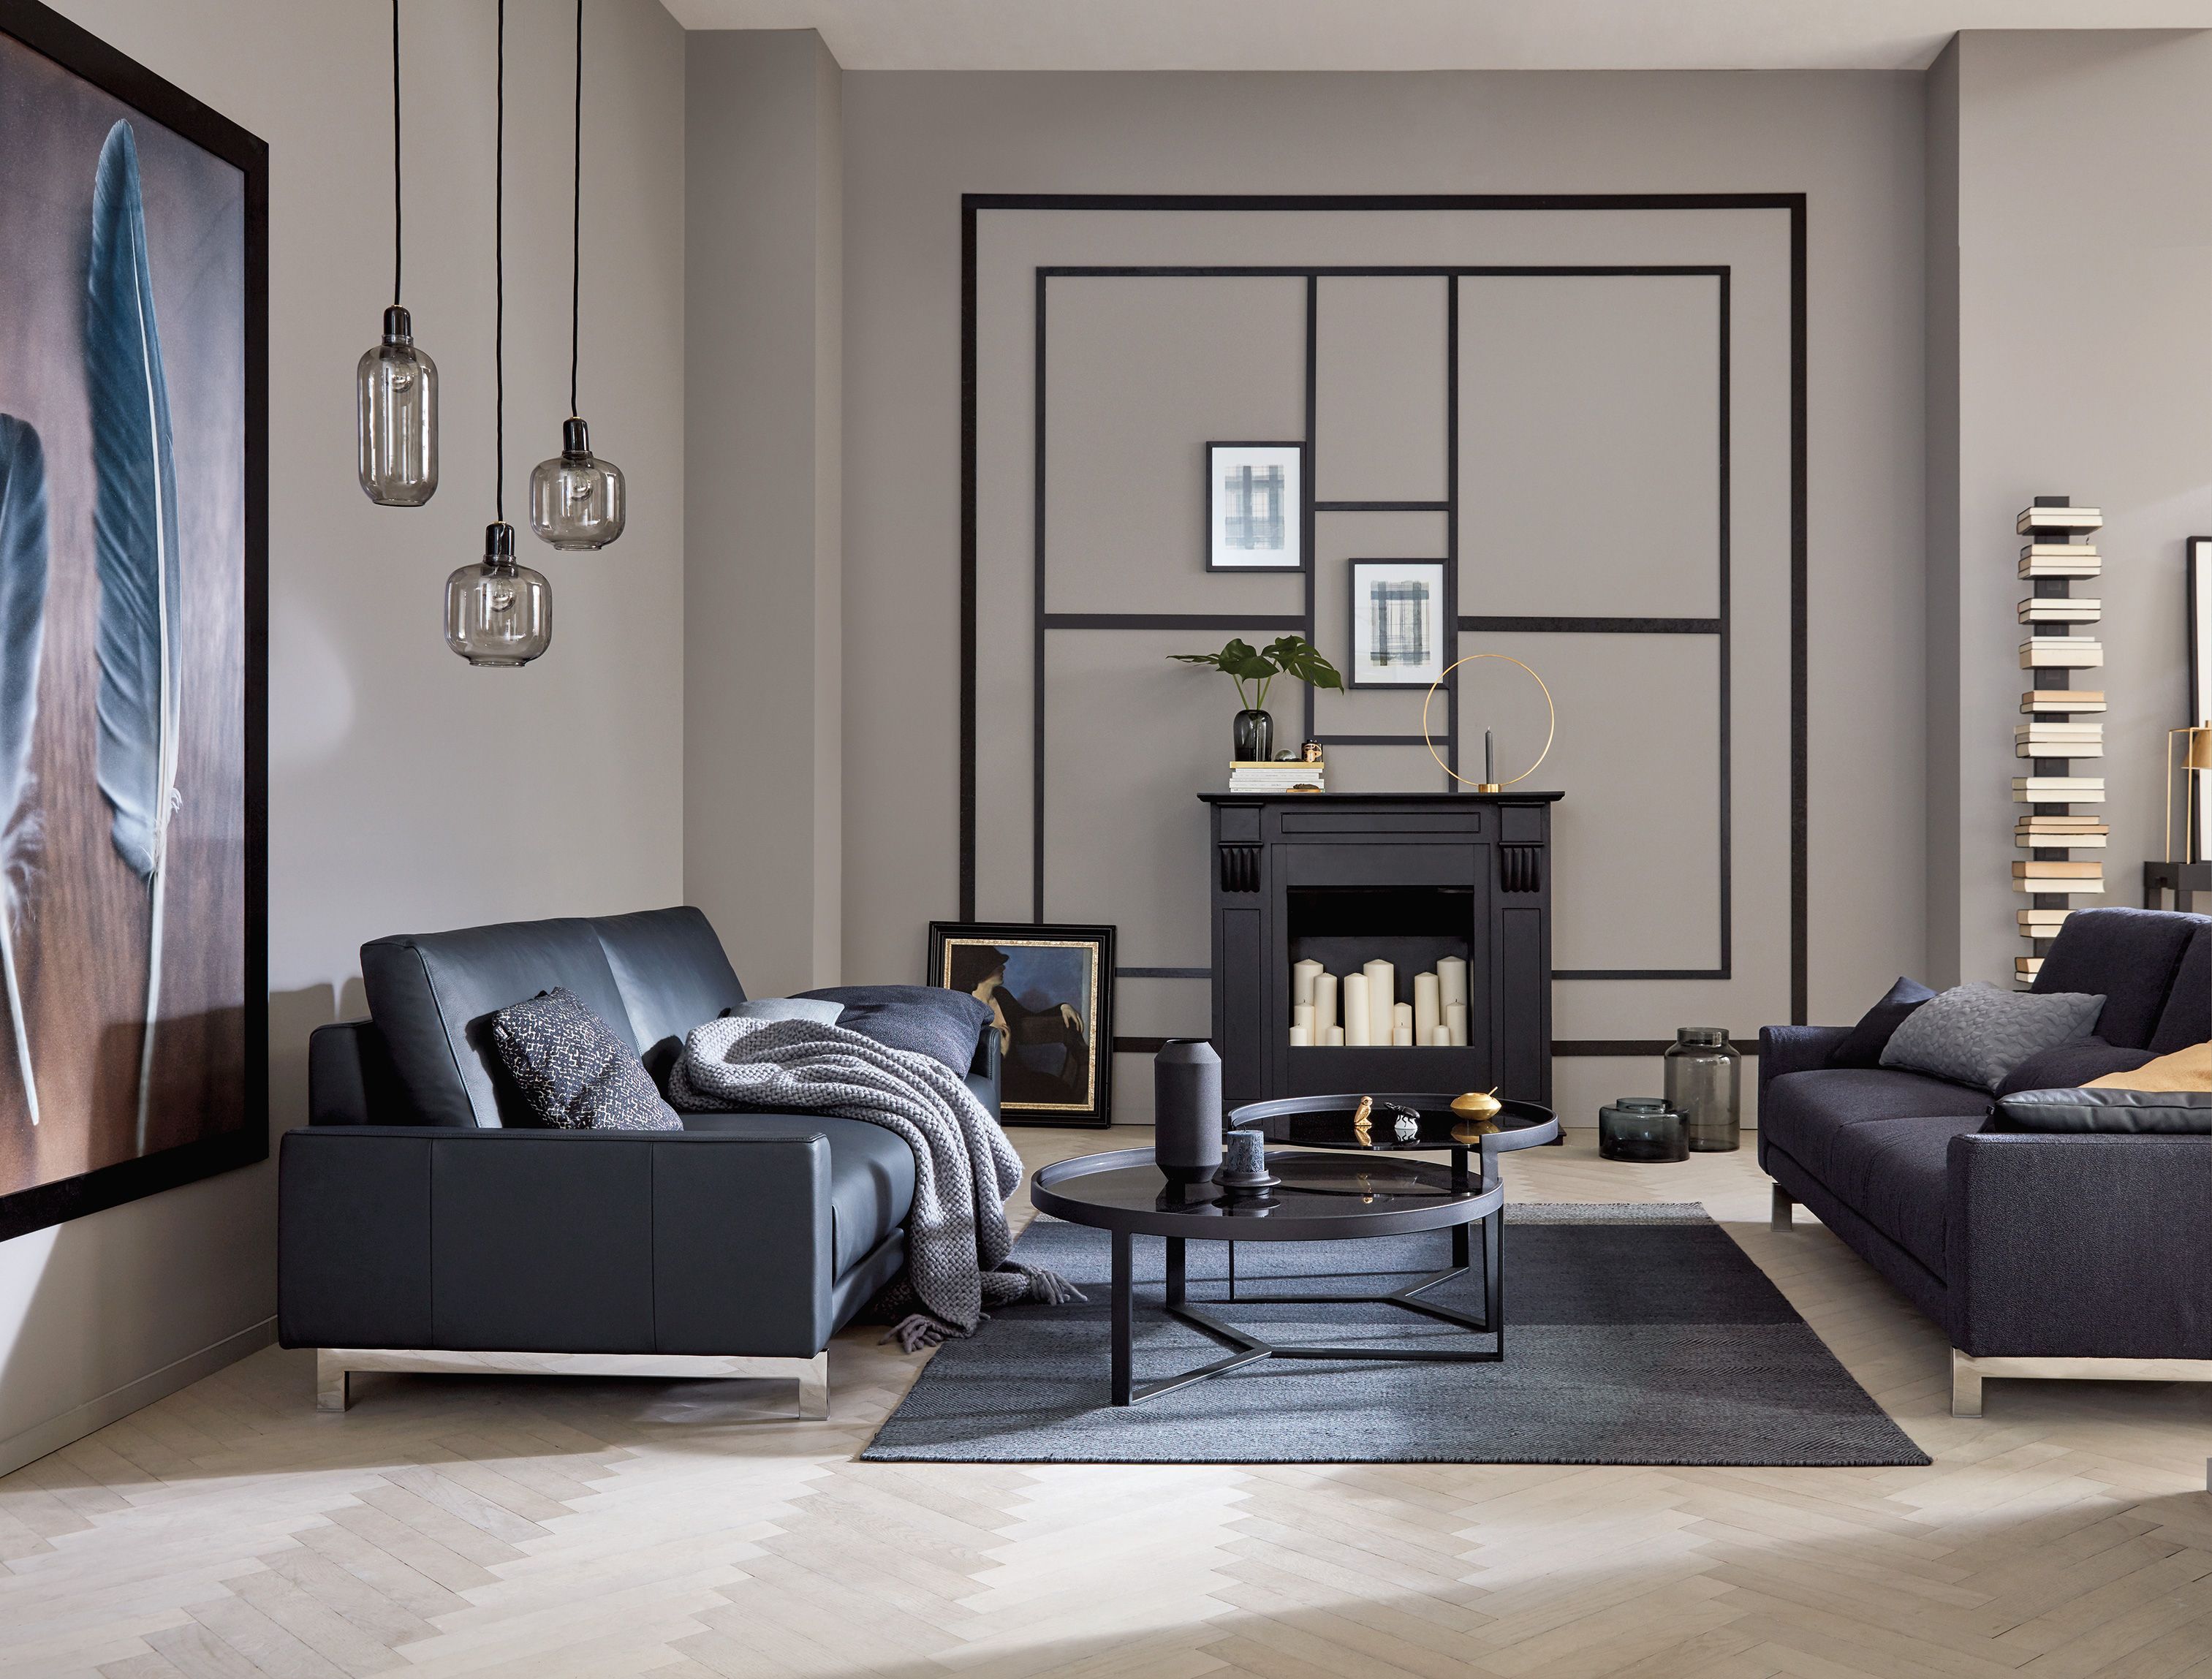 sofa schmal top awesome full size of stressless sessel schmal stressless sessel preisliste. Black Bedroom Furniture Sets. Home Design Ideas